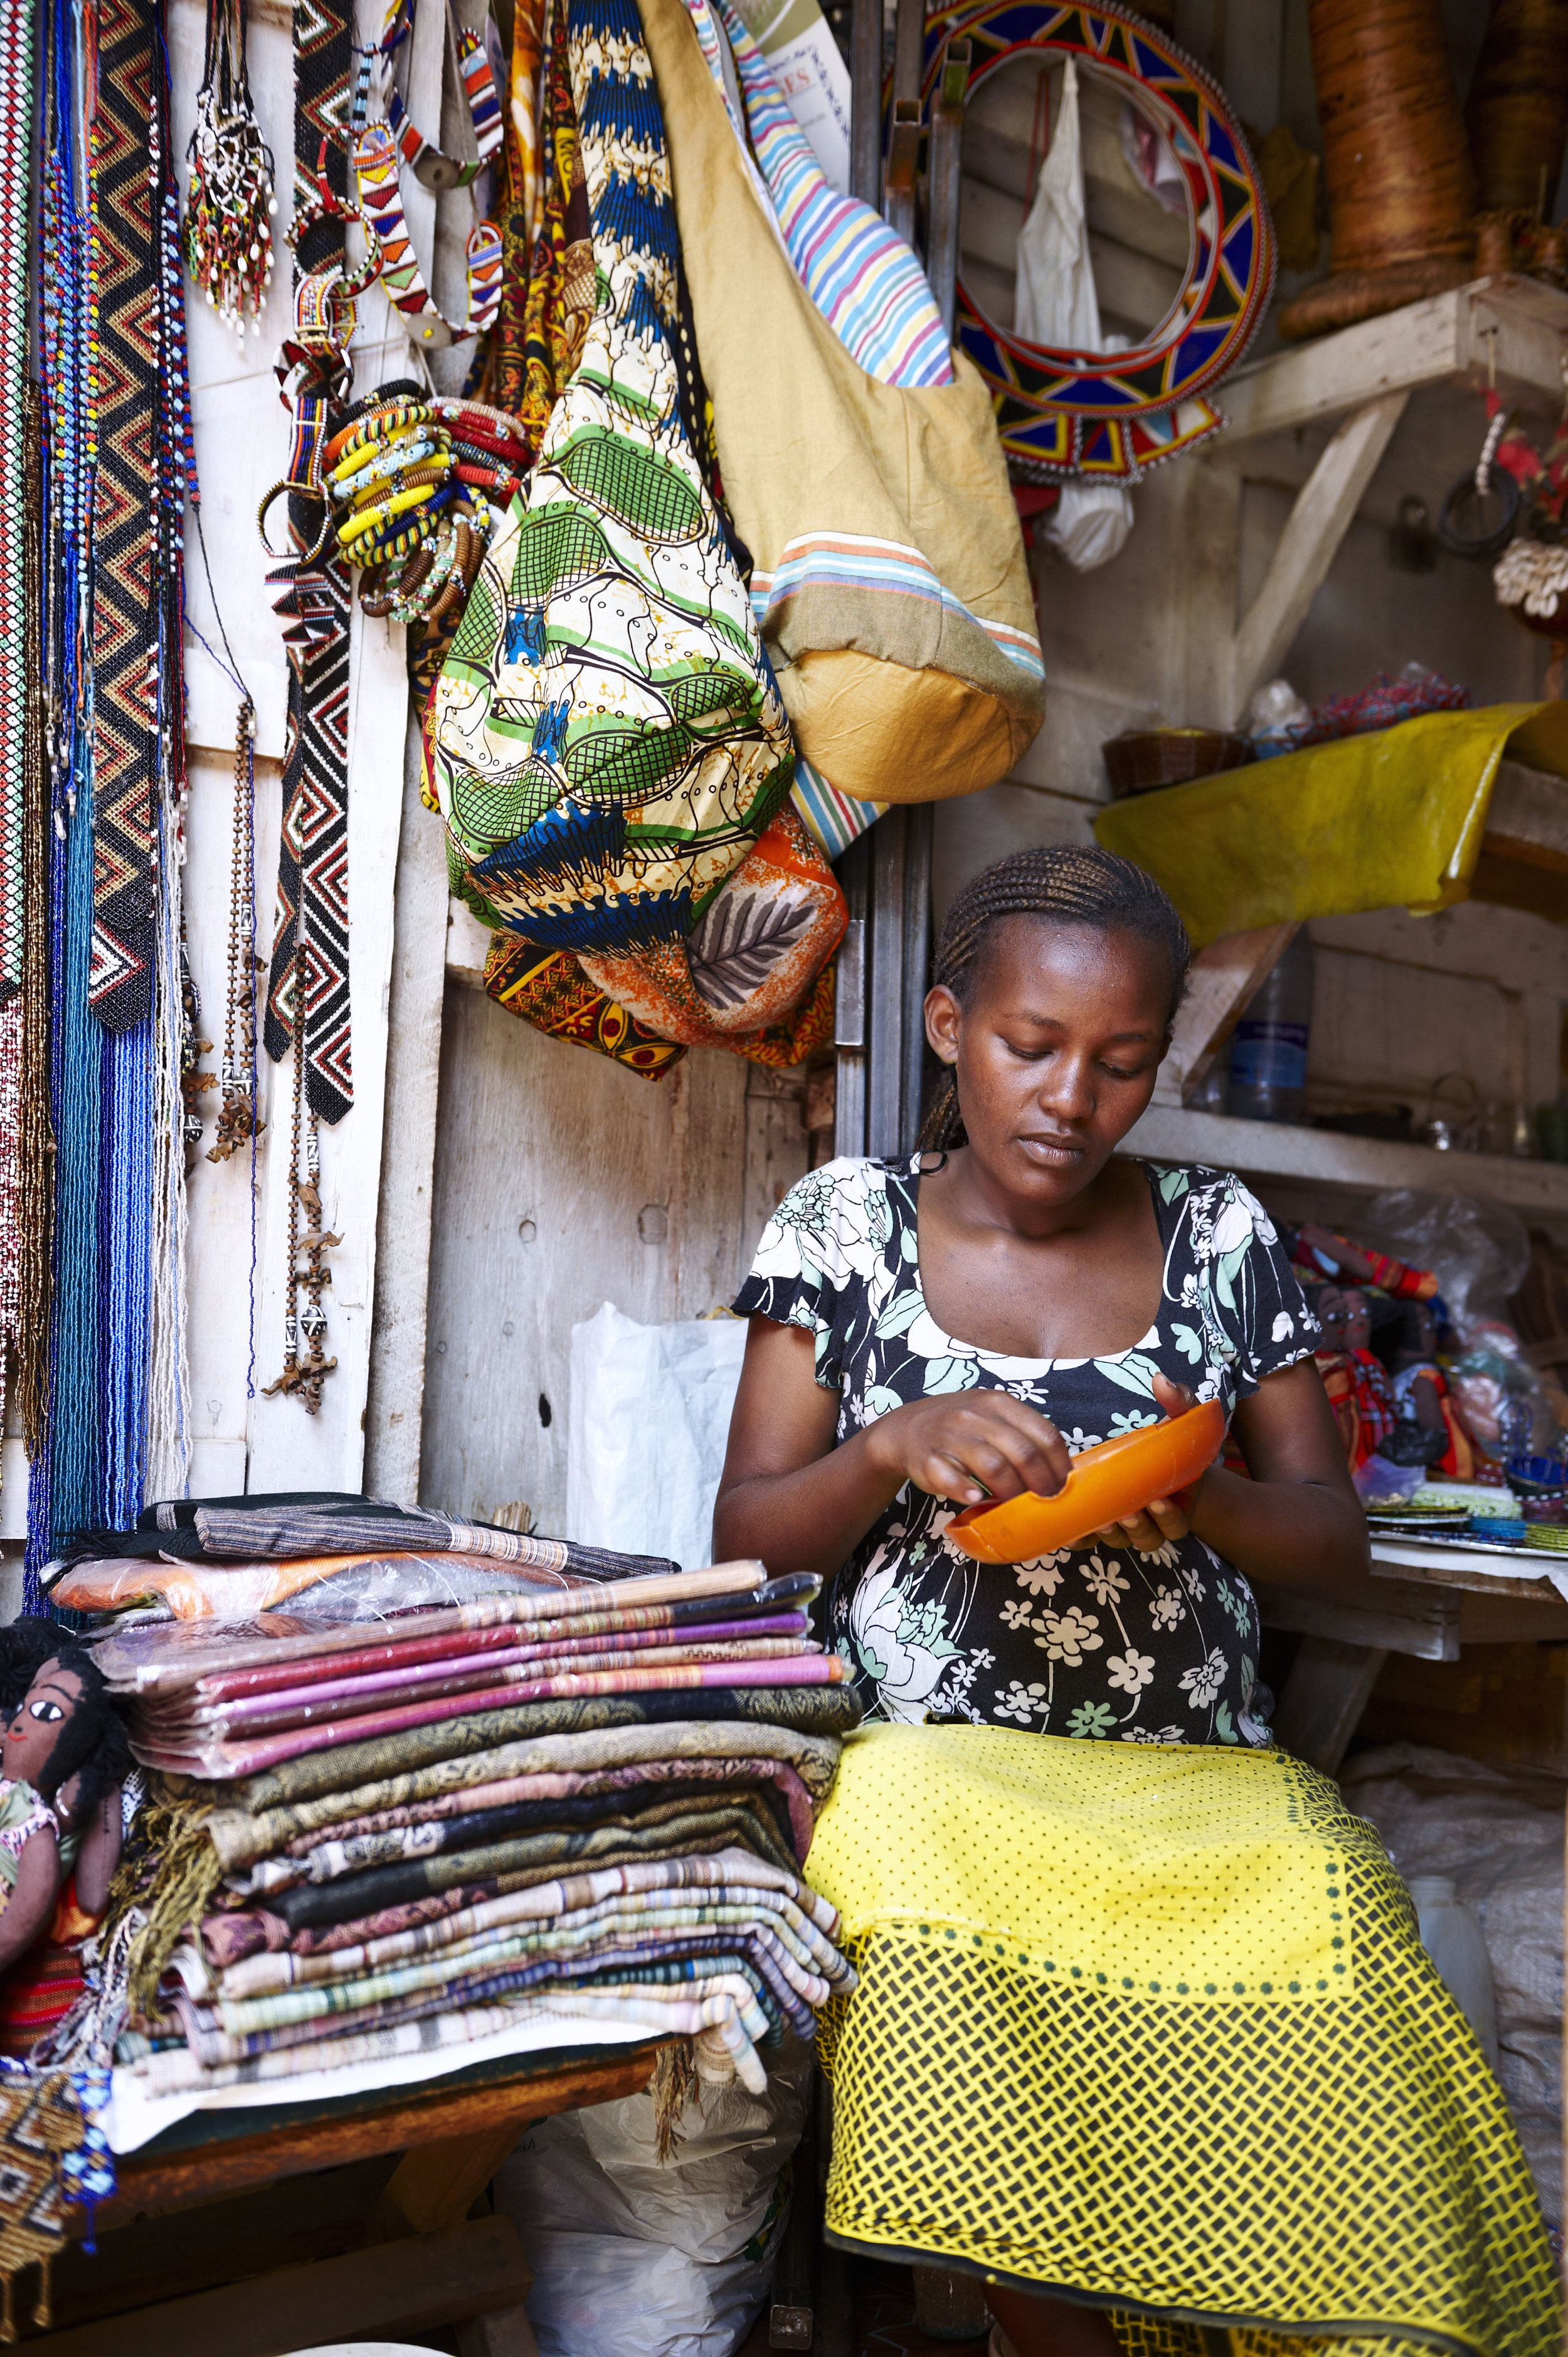 Pregnant woman working in a street market in Nairobi (Kenya)